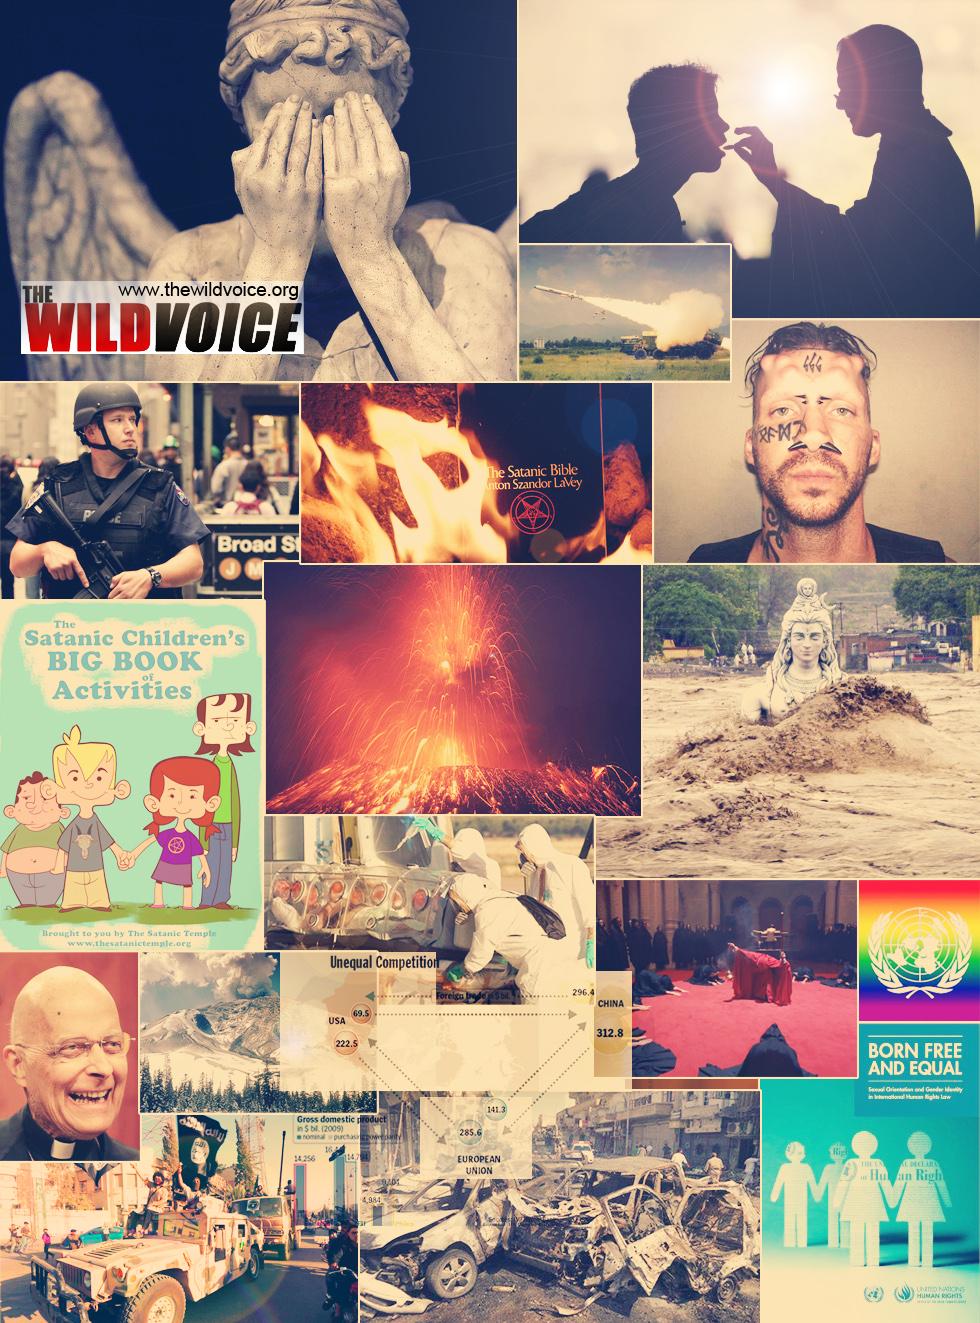 THE WILD VOICE, THE WILD REPORT, War, satan, volcanos, apocalypse, false prophet, hurch of satan, catholic church